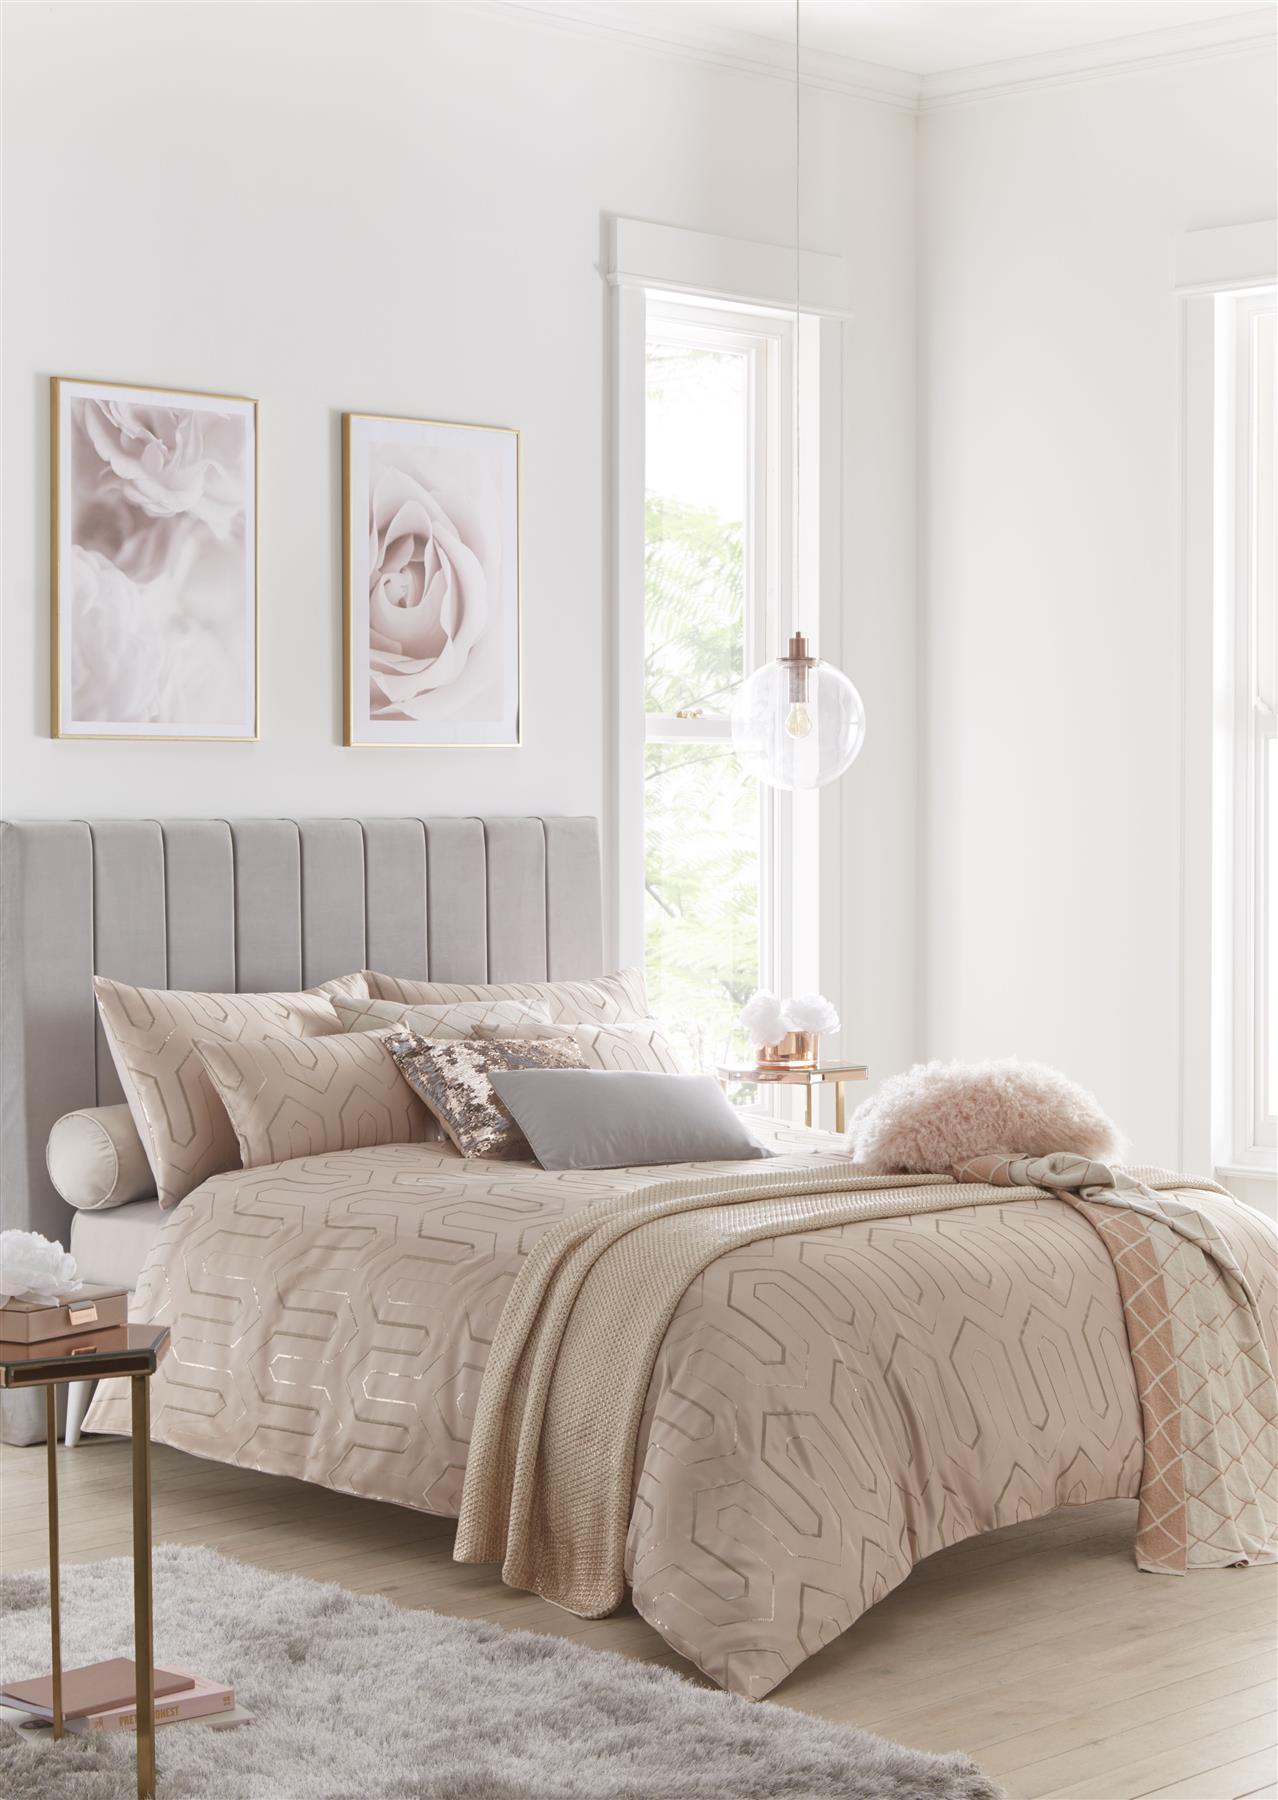 Tess Daly Phoebe Blush Embroideredsuper King Size Duvet Cover 5 Piece Beddingset Ebay